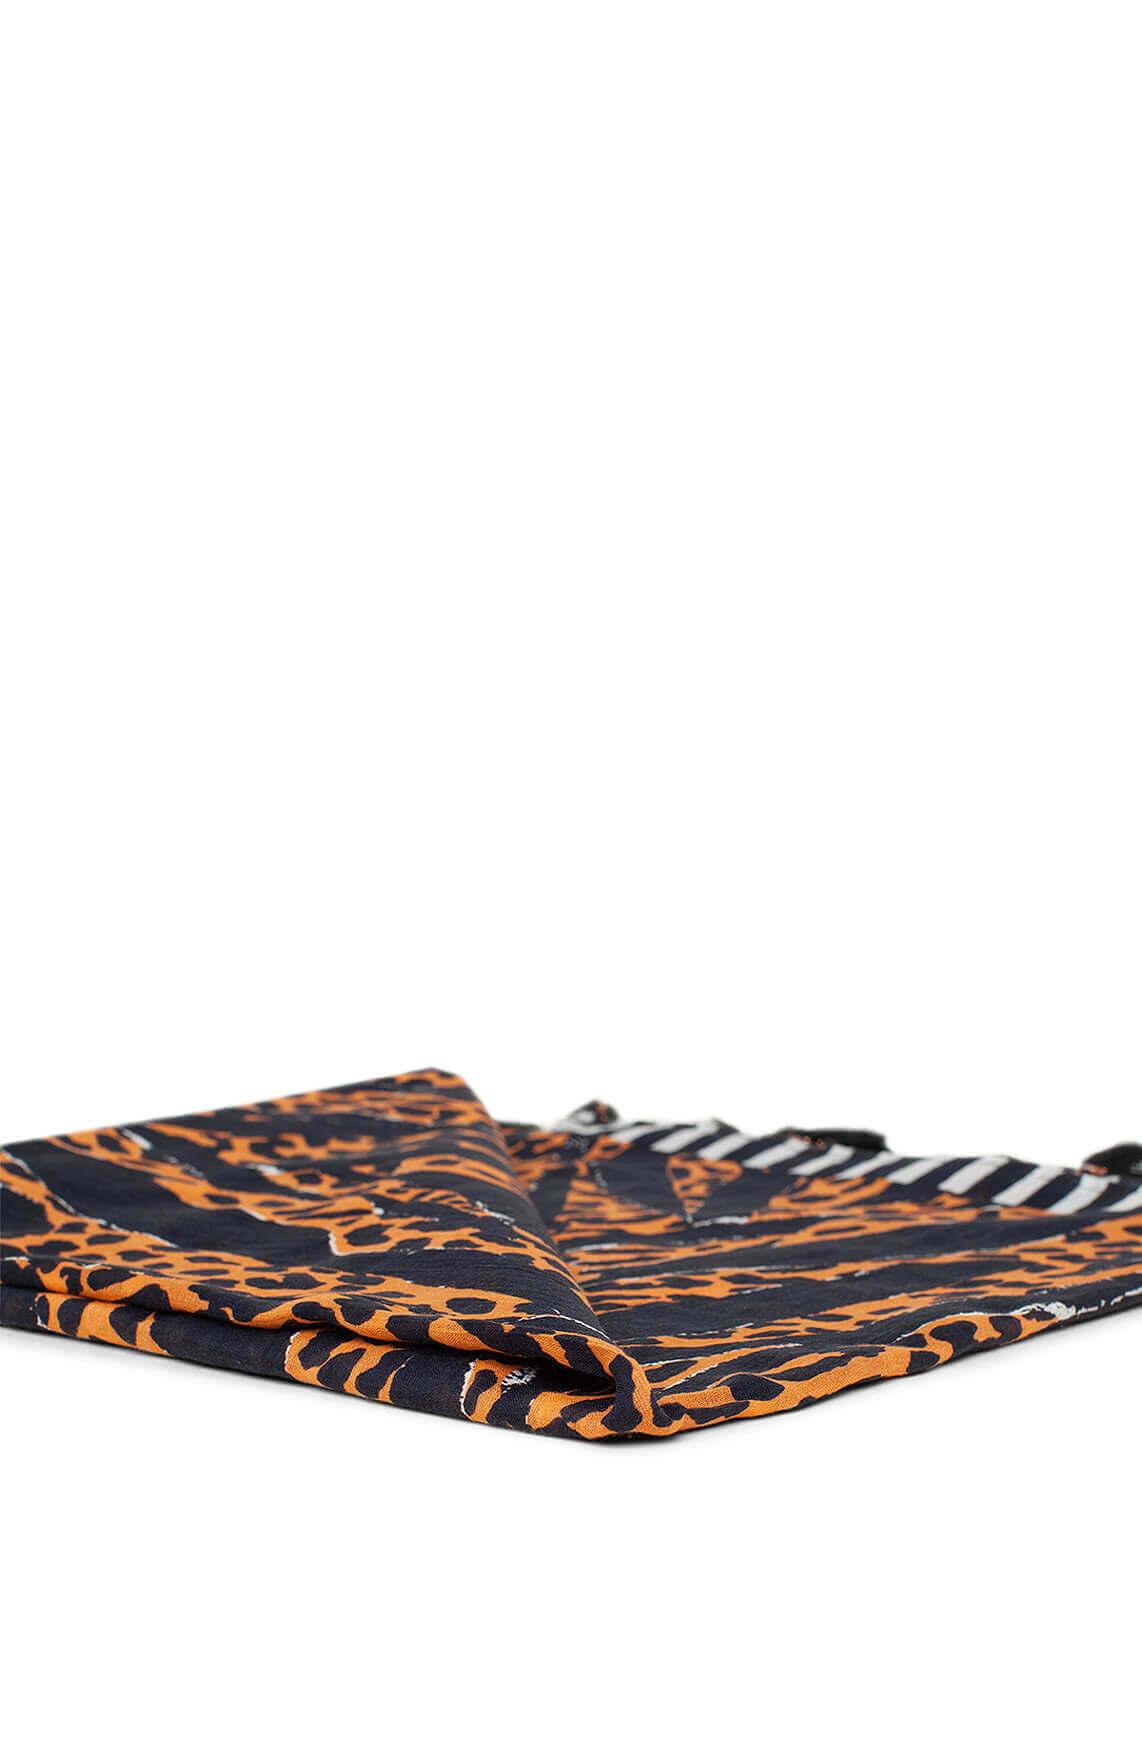 Anna Dames Shawl met animalprint Oranje